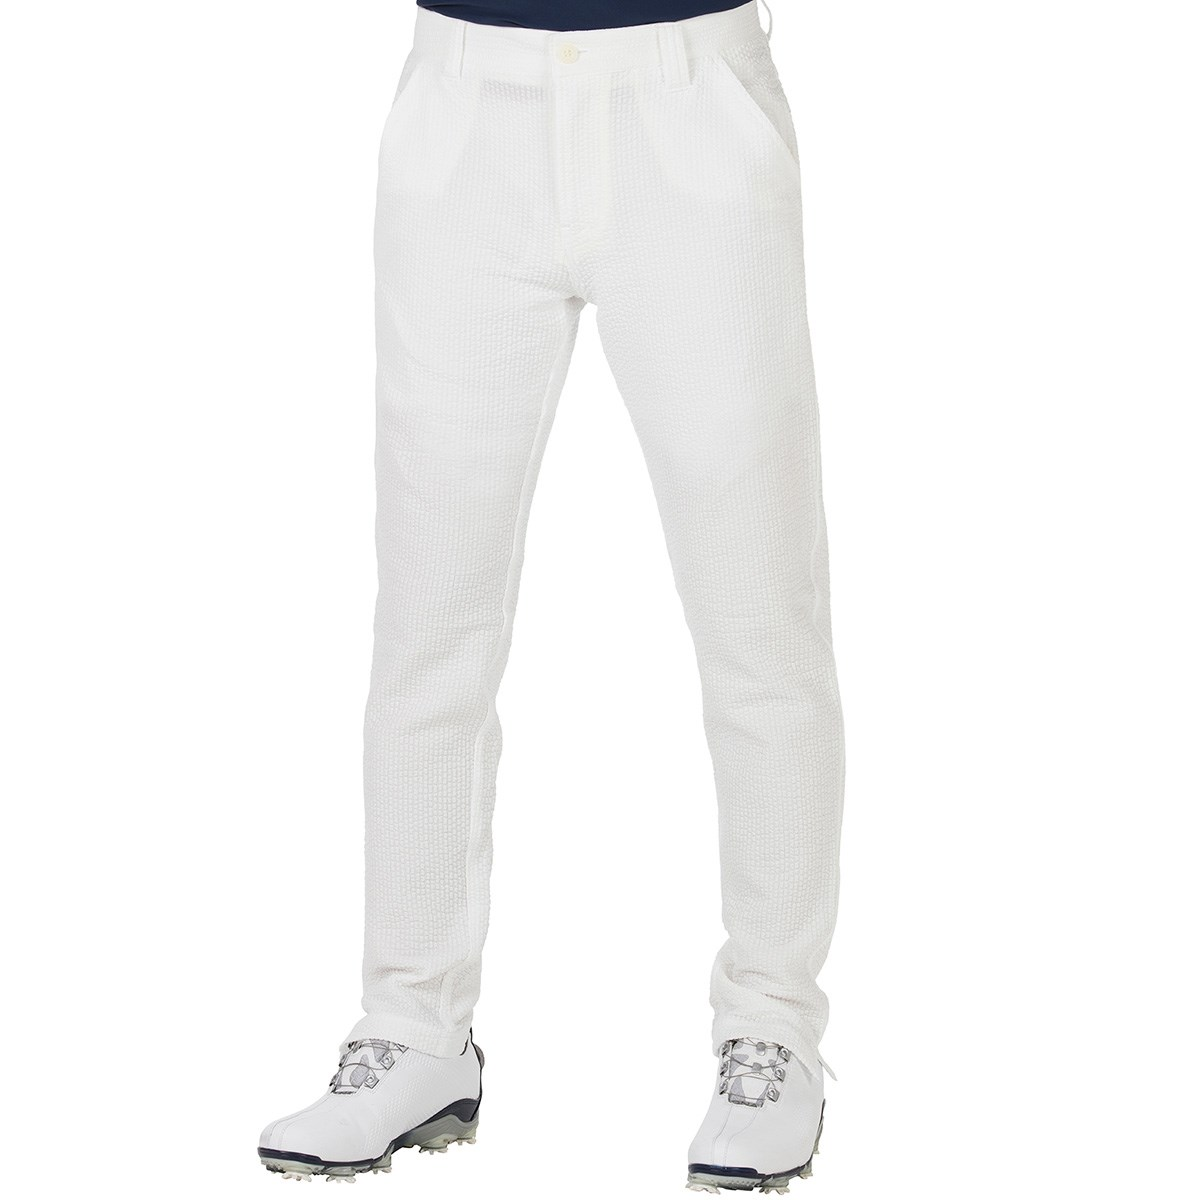 GDO オリジナル GDO ORIGINAL サッカージャージパンツ 股下79cm 1:ウエスト目安75-77 ホワイト